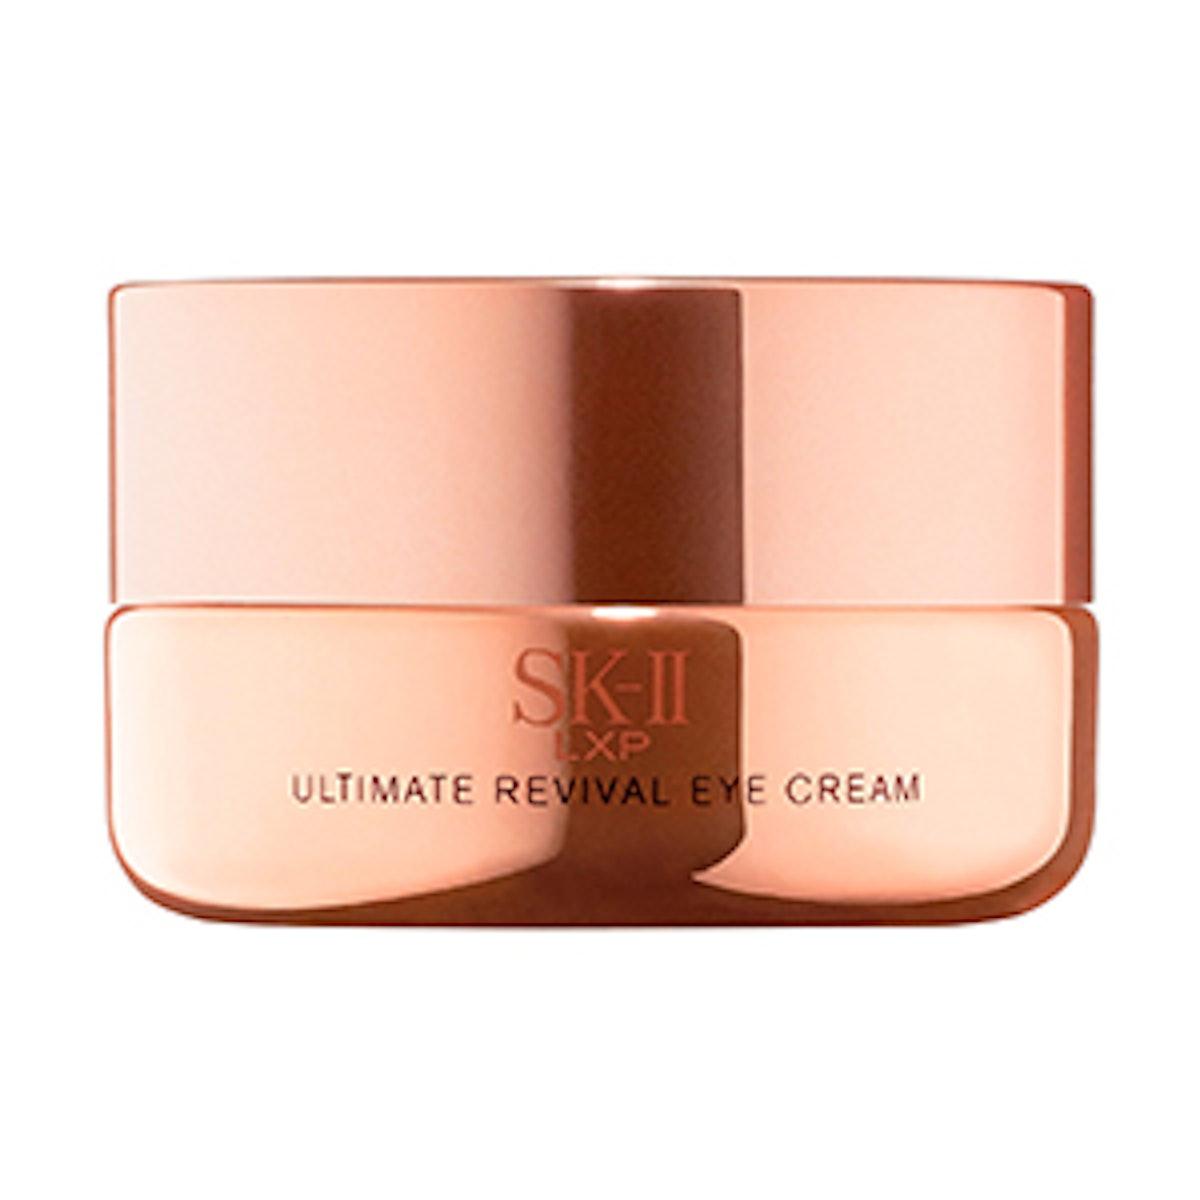 Ultimate Revival Eye Cream